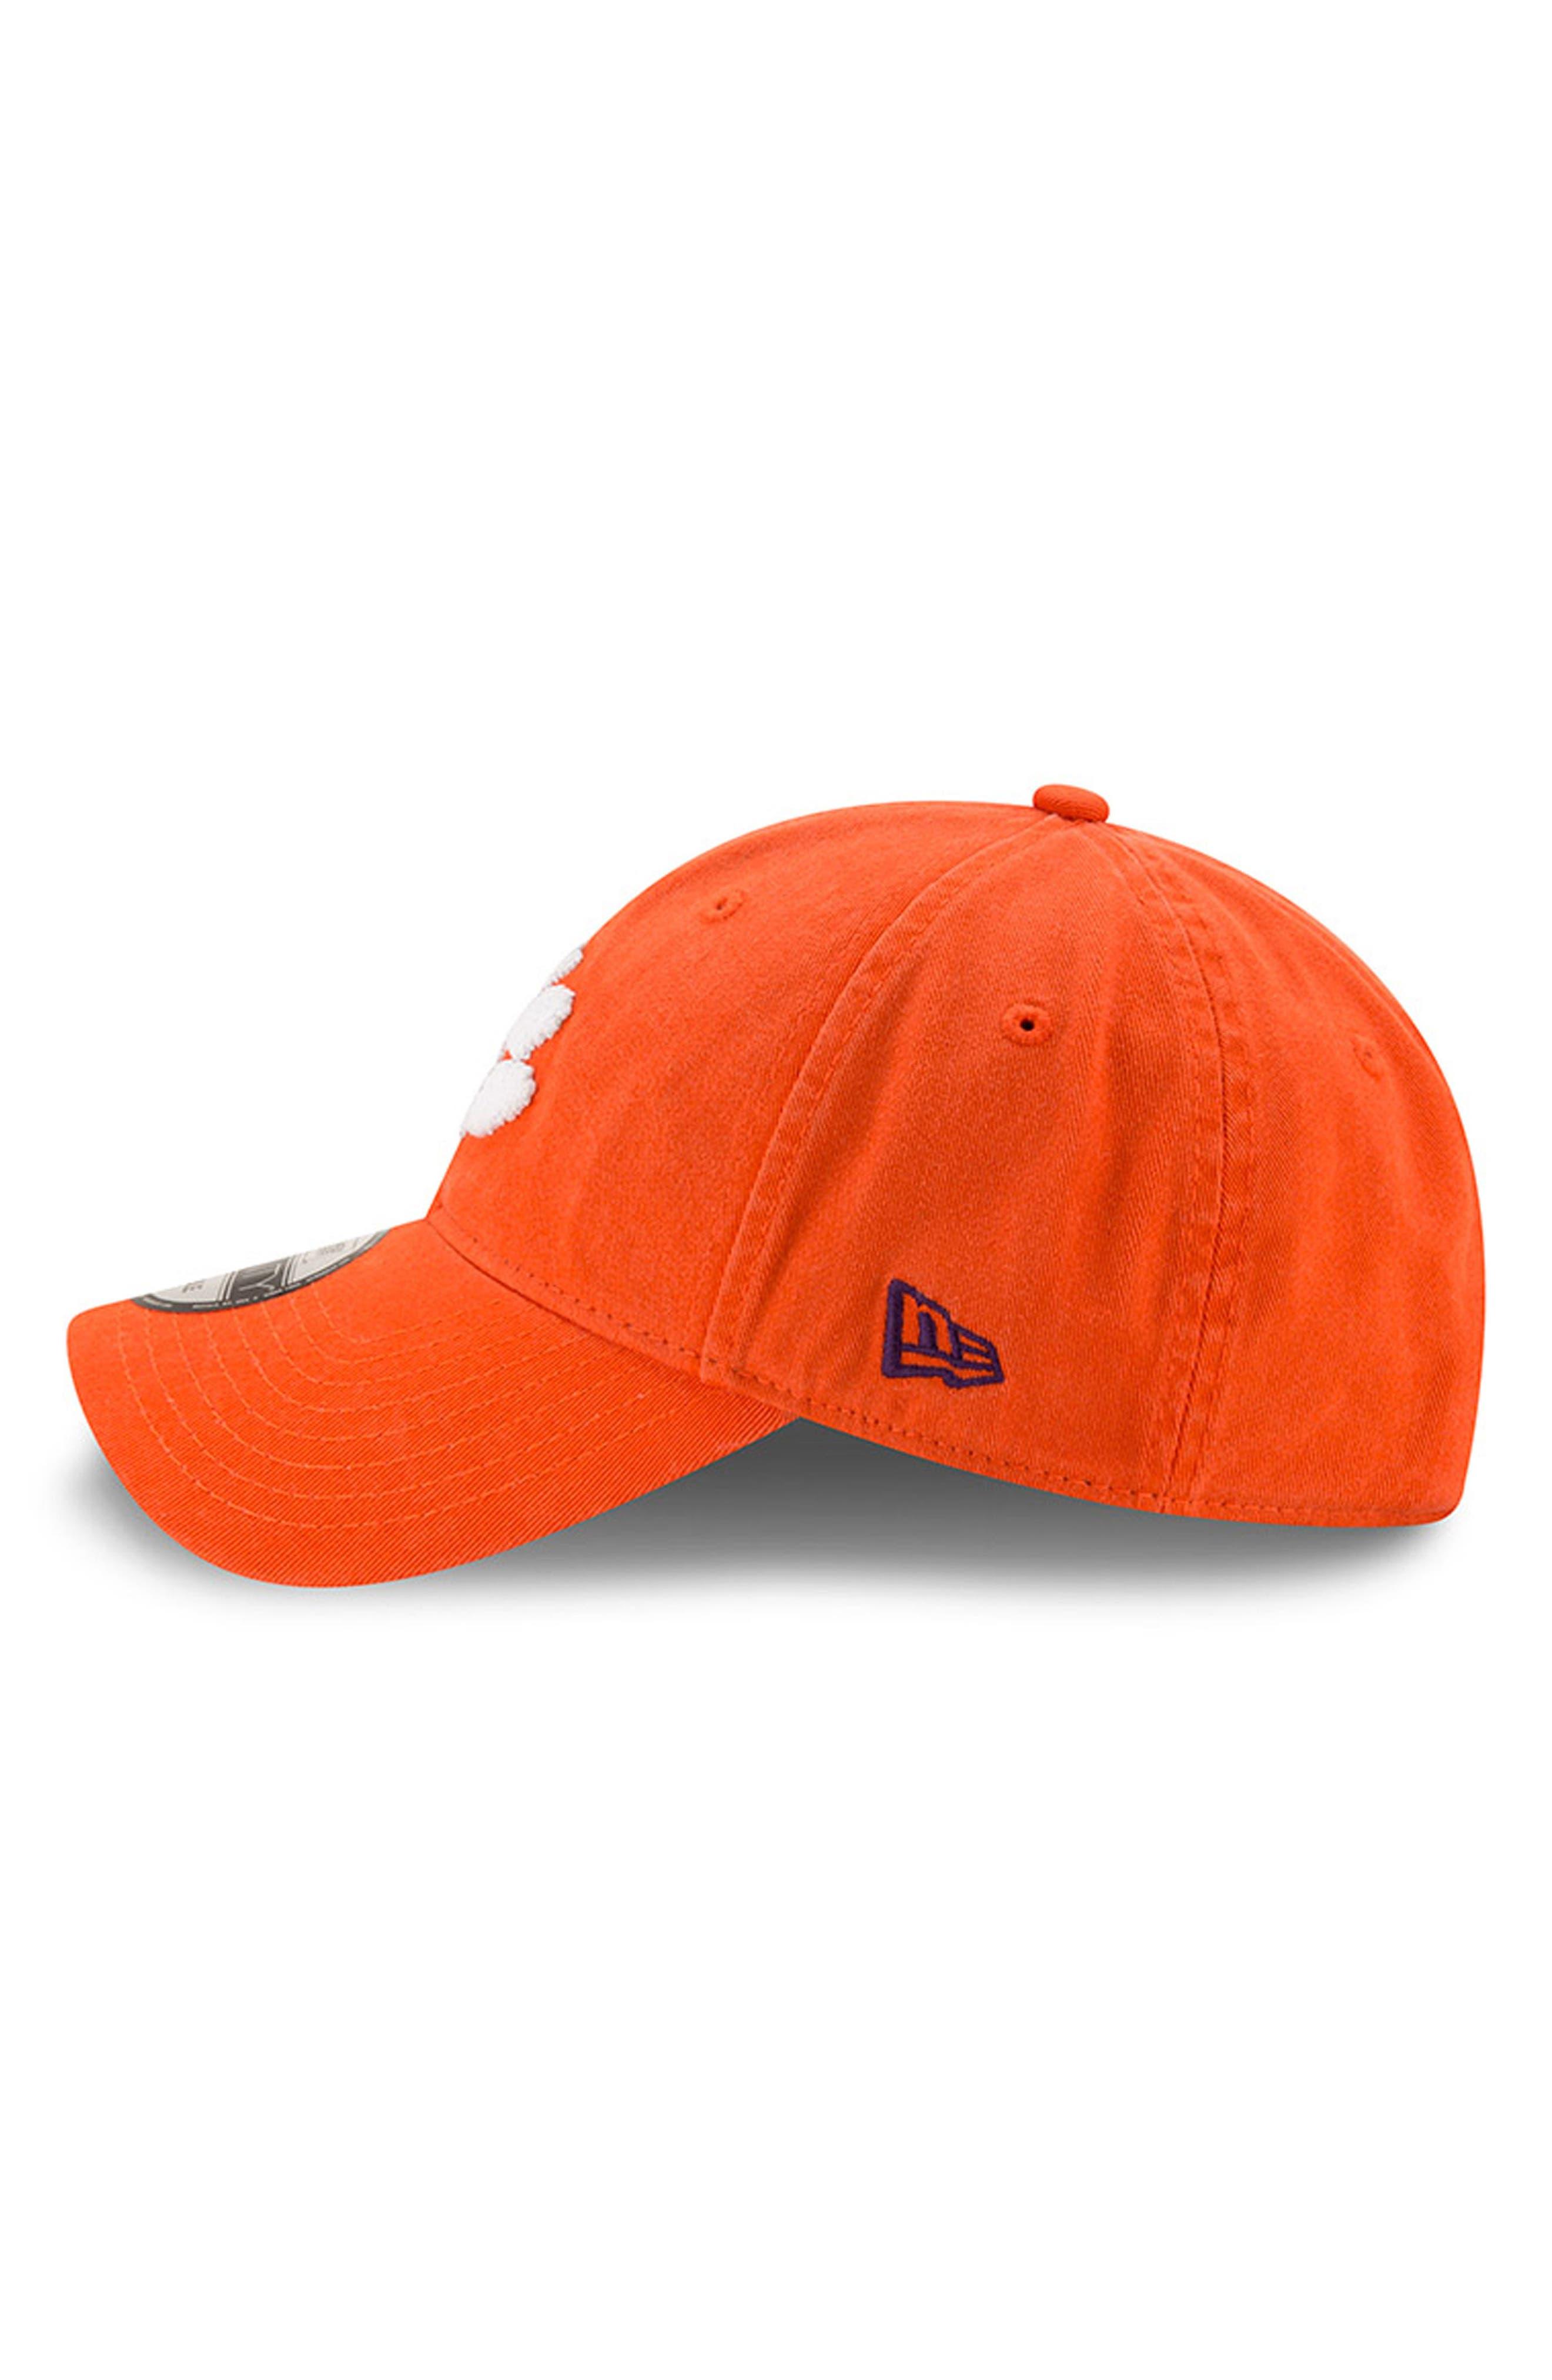 Alternate Image 3  - New Era Collegiate Core Classic - Clemson Tigers Baseball Cap